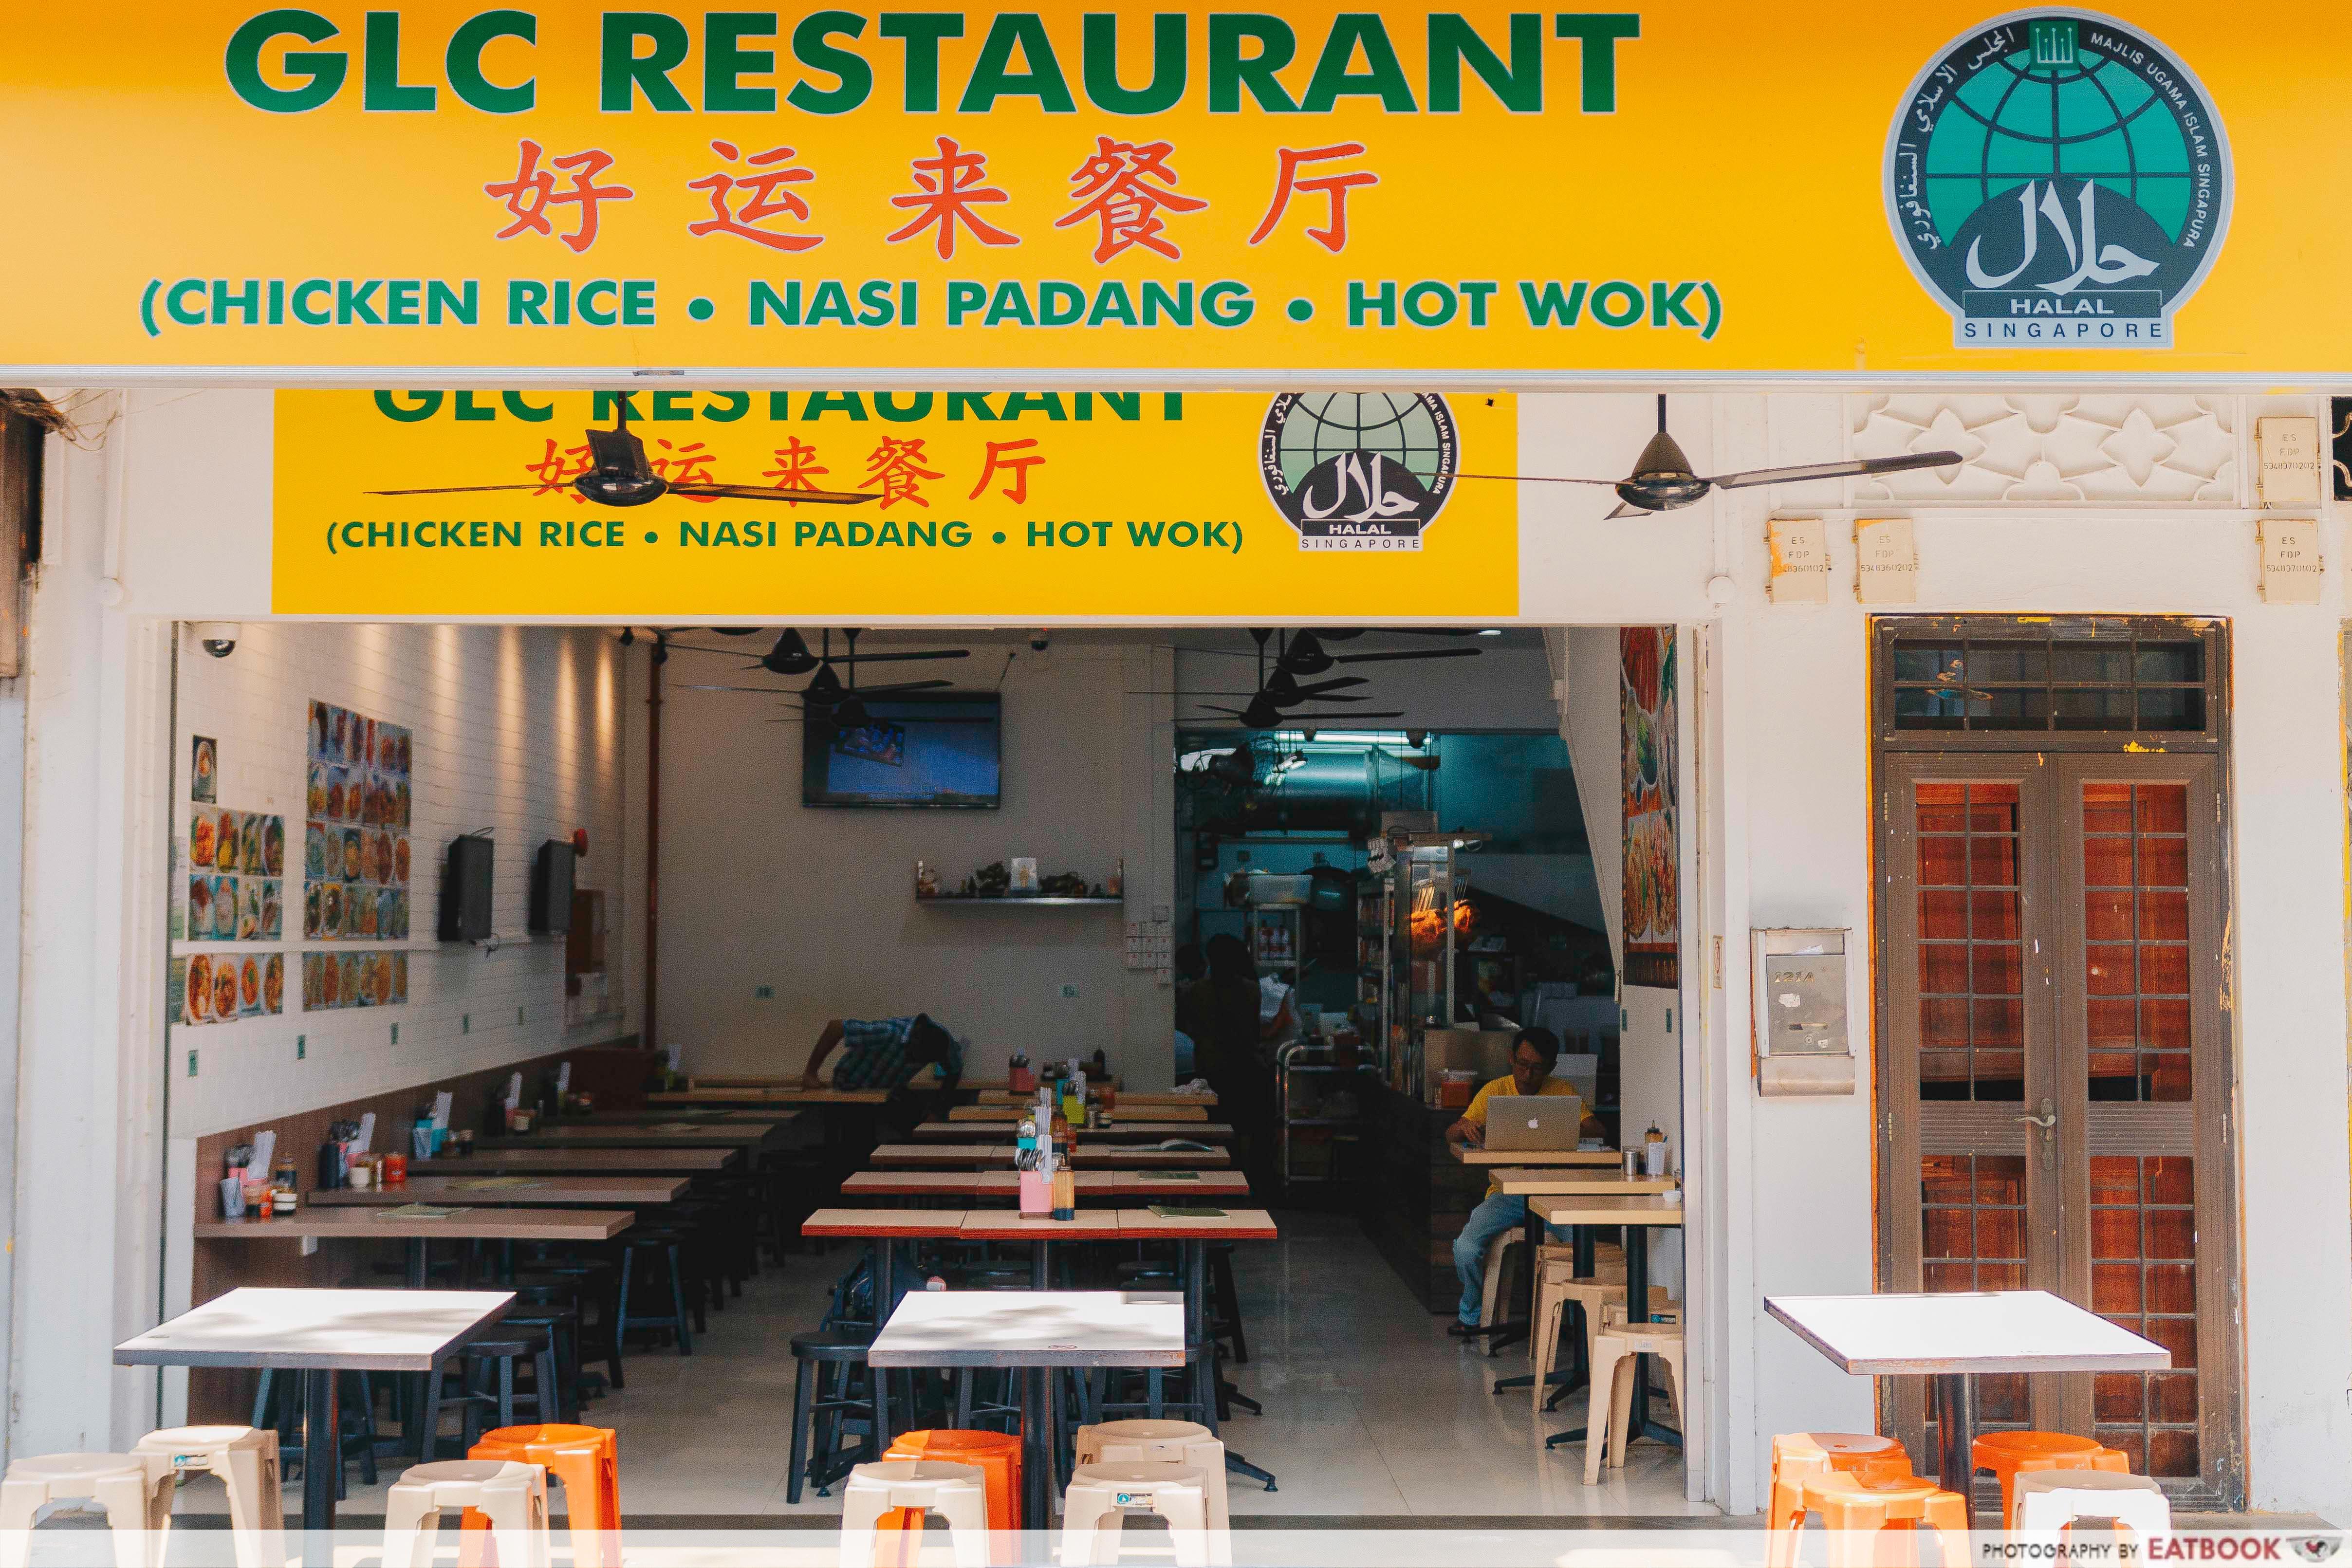 GLC Restaurant - storefront